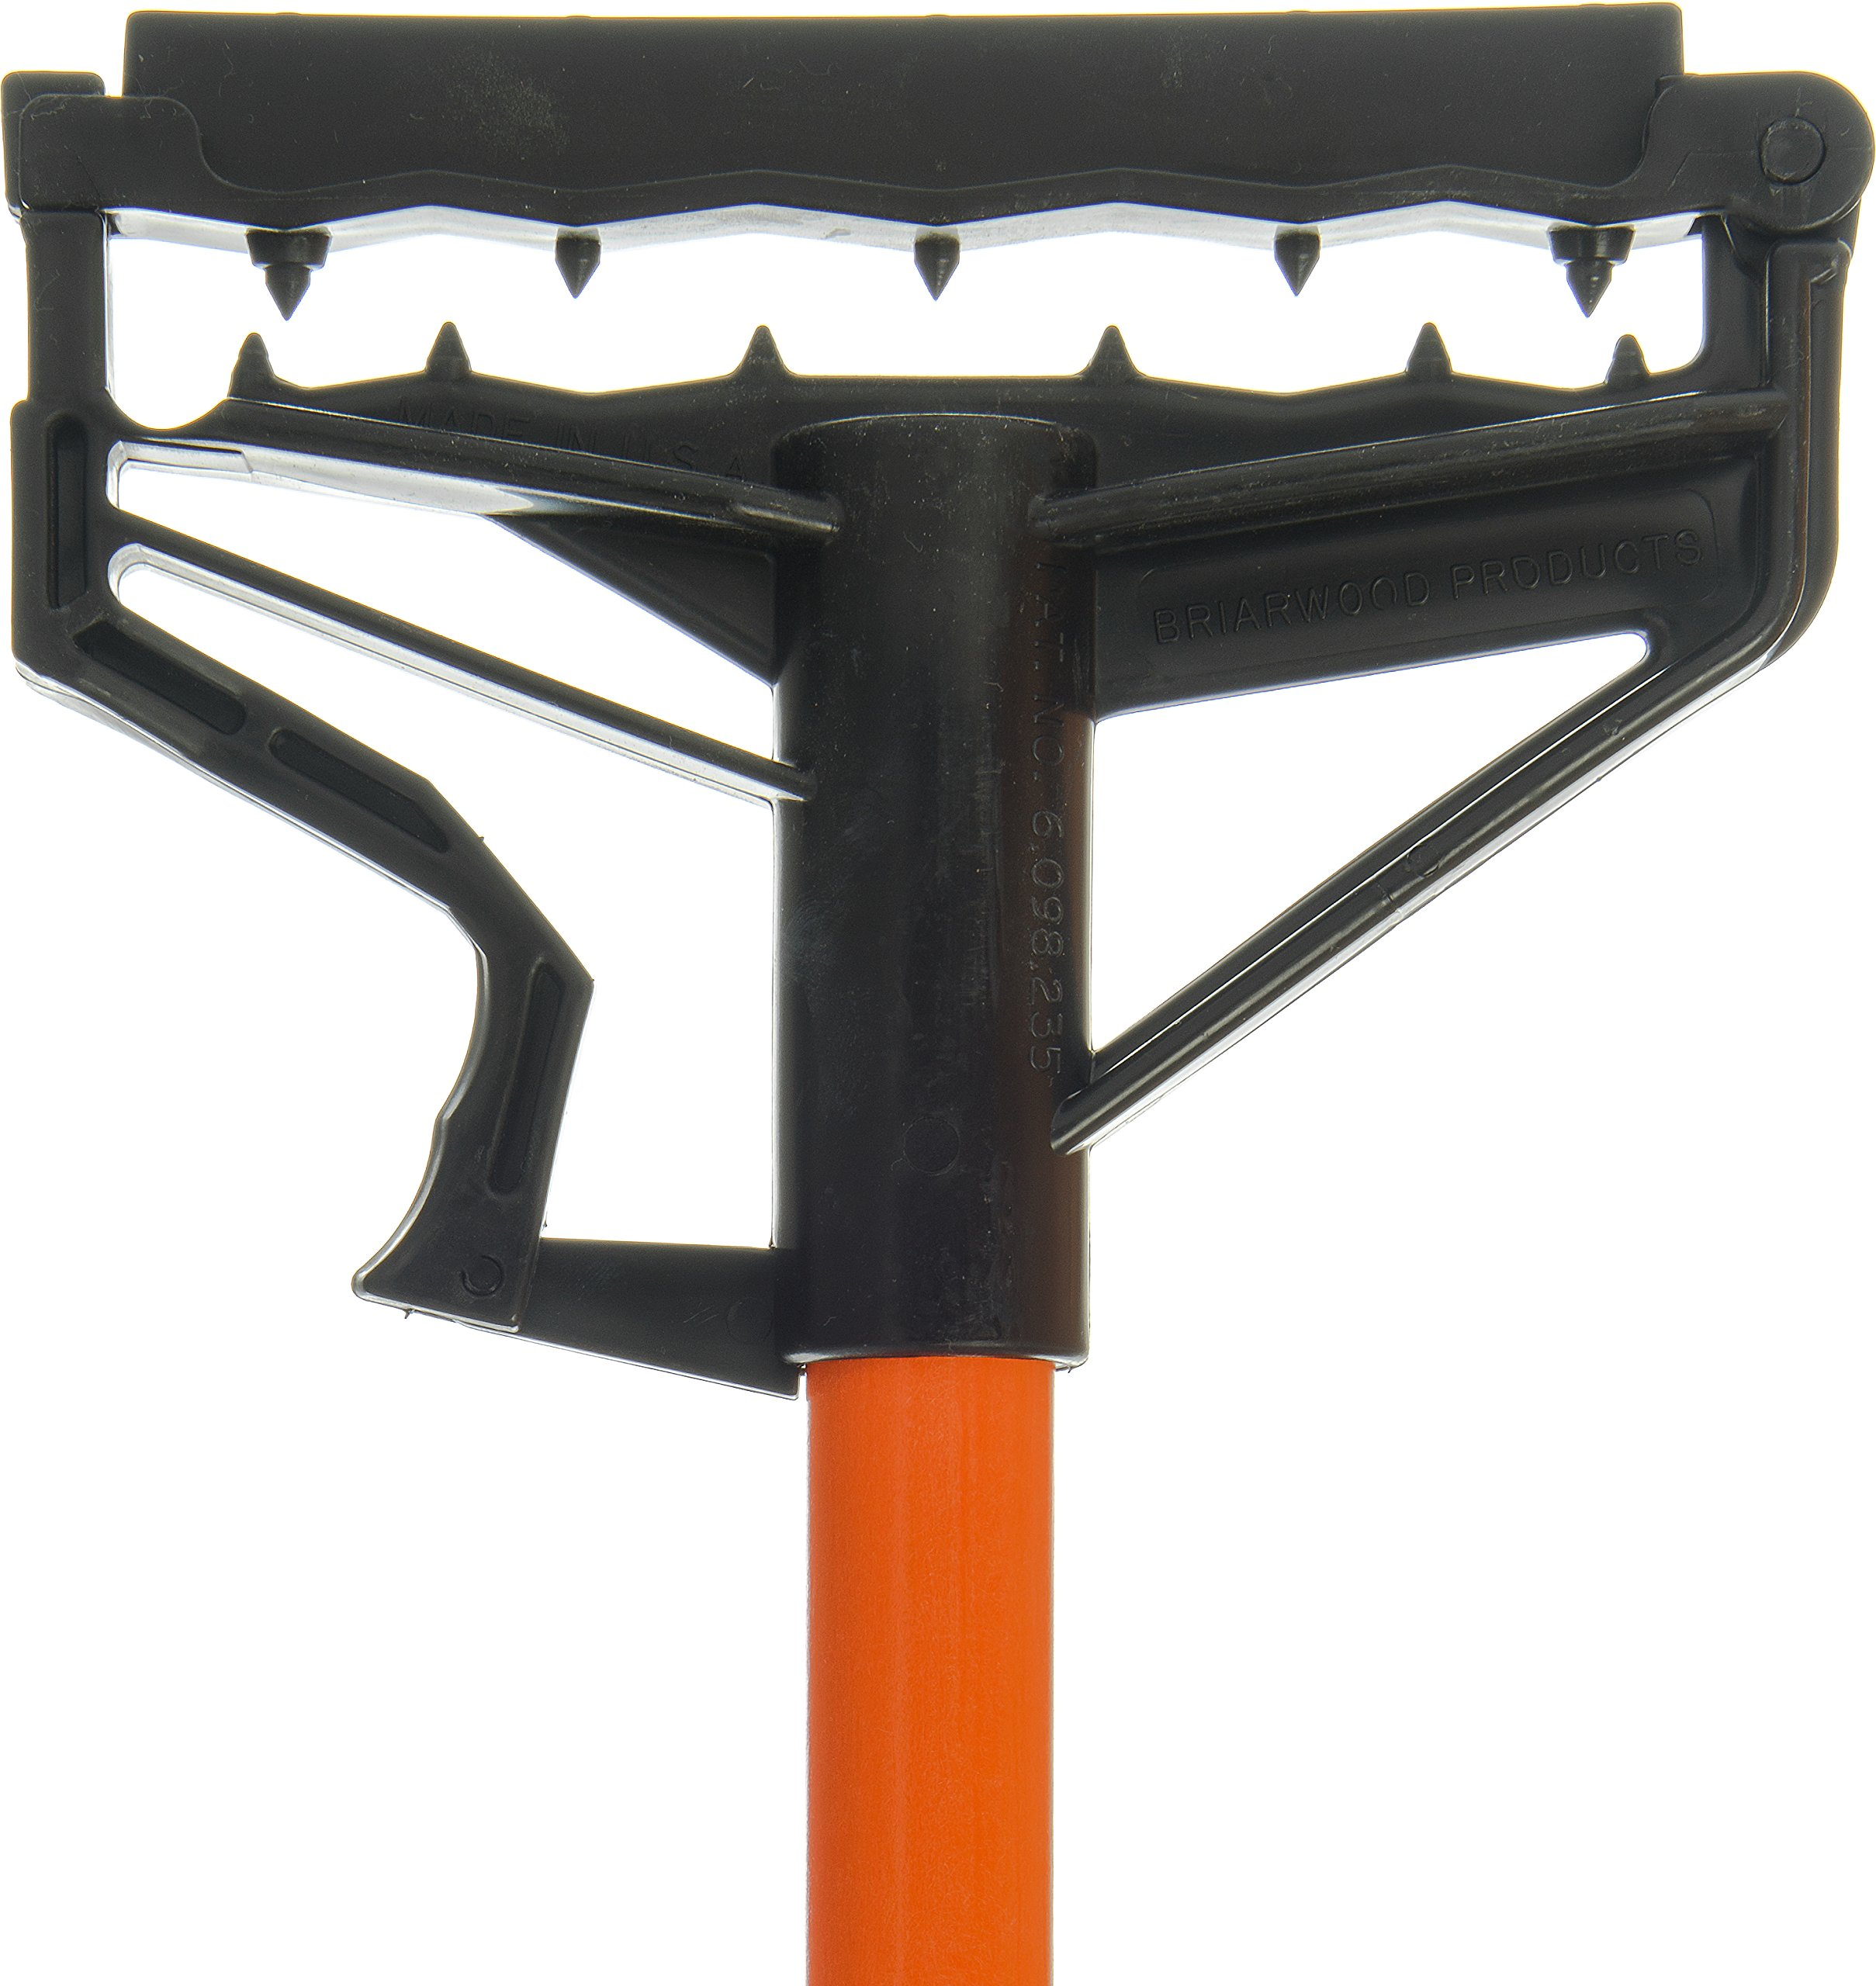 Carlisle 4166424 Commercial Side-Gate Fiberglass Wet Mop Handle, 60'', Orange by Carlisle (Image #2)